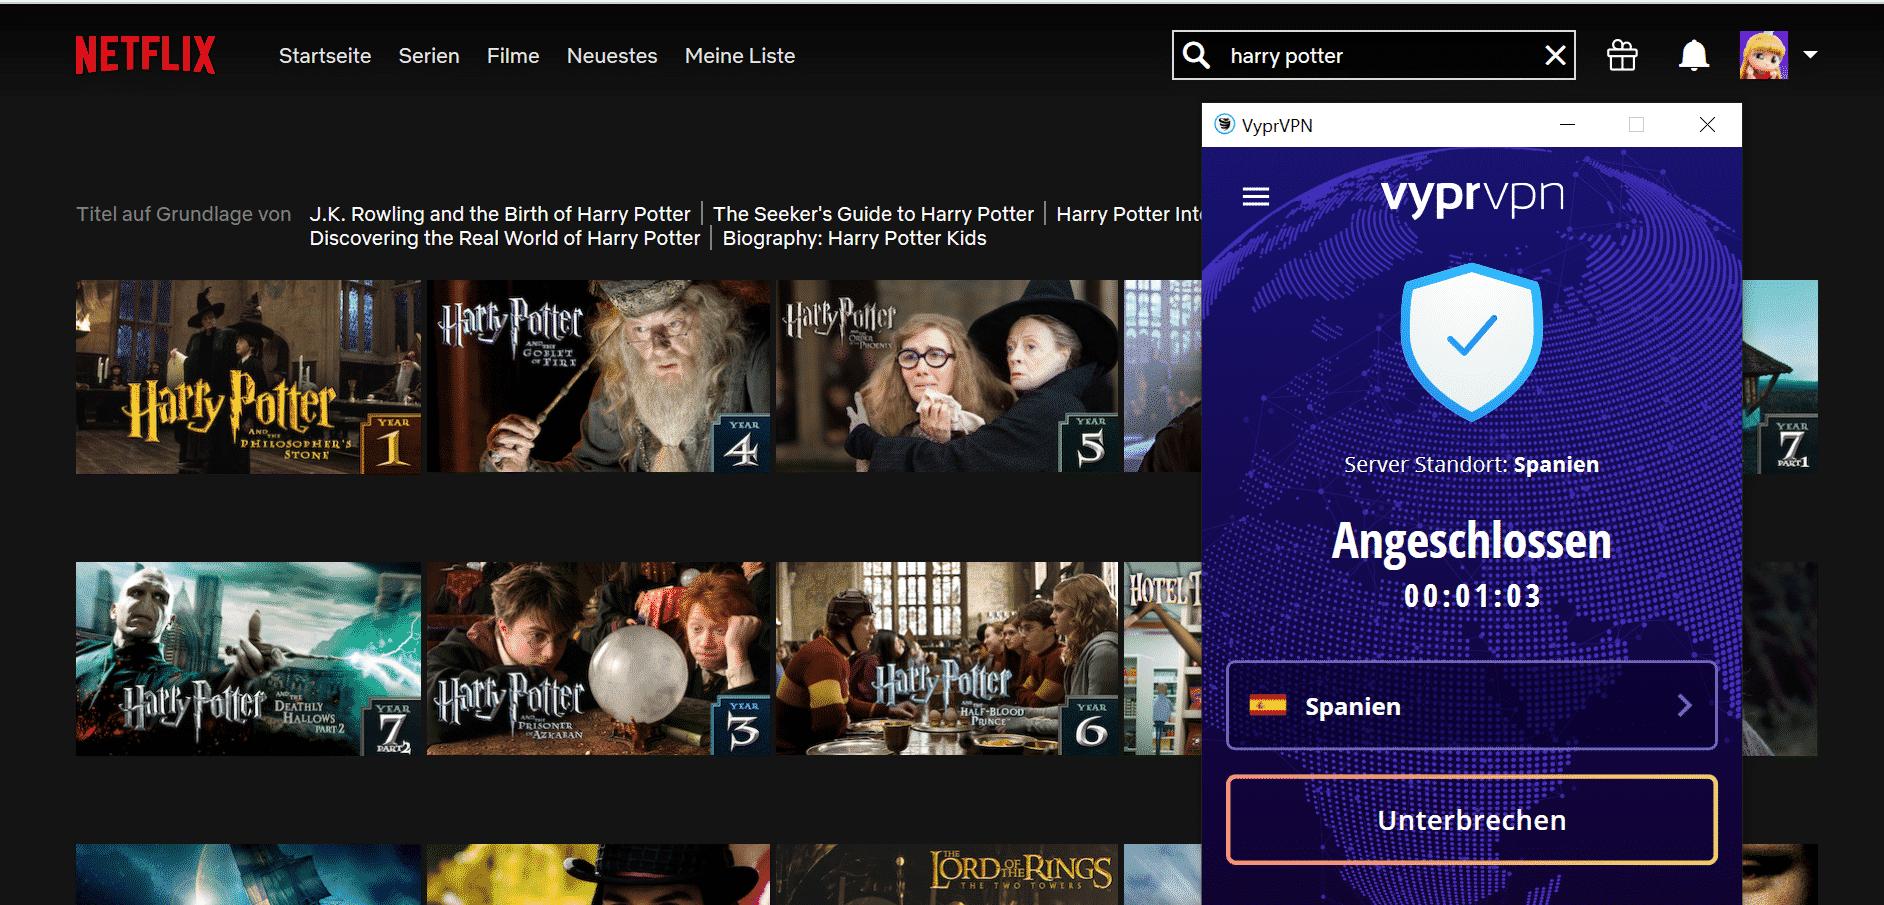 Harry Potter Netflix 2021 Alle 8 Filme Kostenlos Streamen